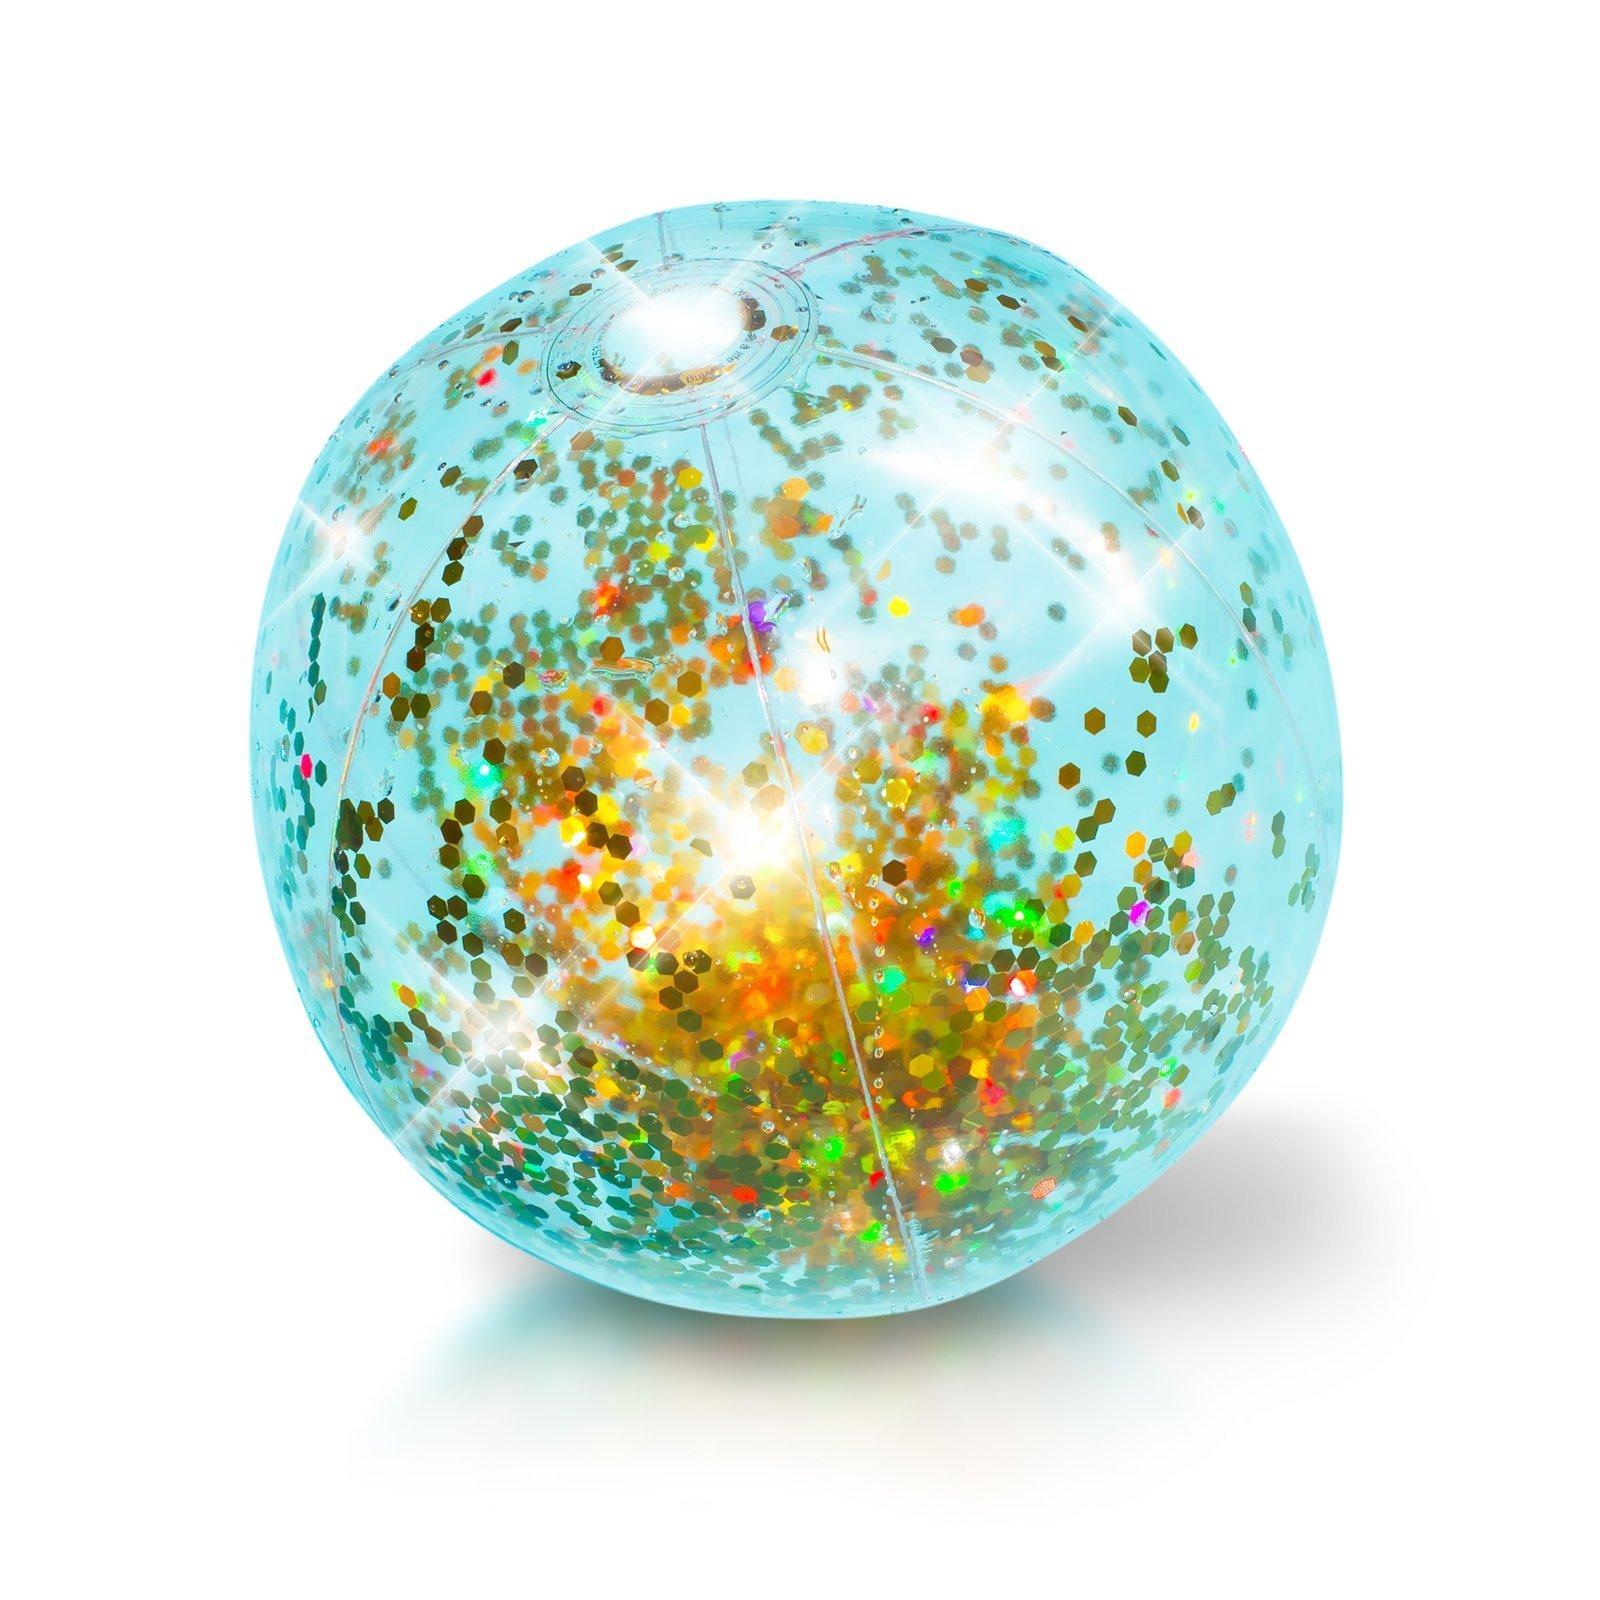 Pool Candy Glitter Inflatable 13.75 Jumbo Beach Ball - Gold